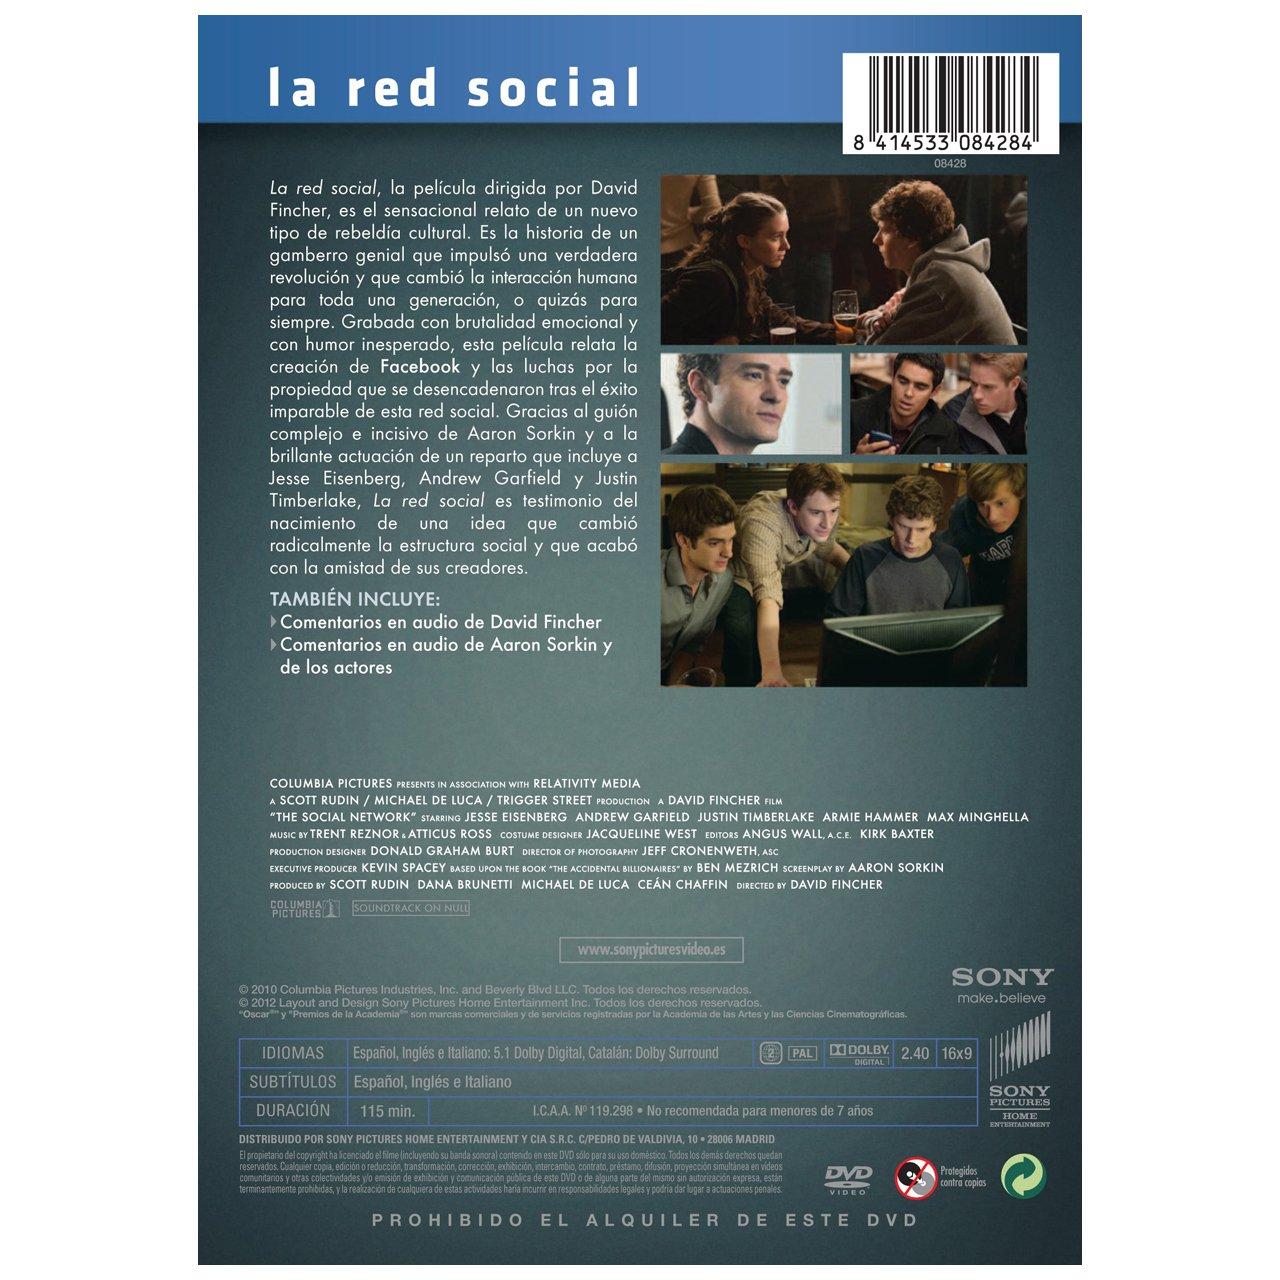 La Red Social [DVD]: Amazon.es: Jesse Eisenberg, Andrew Garfield, Justin Timberlake, David Fincher: Cine y Series TV